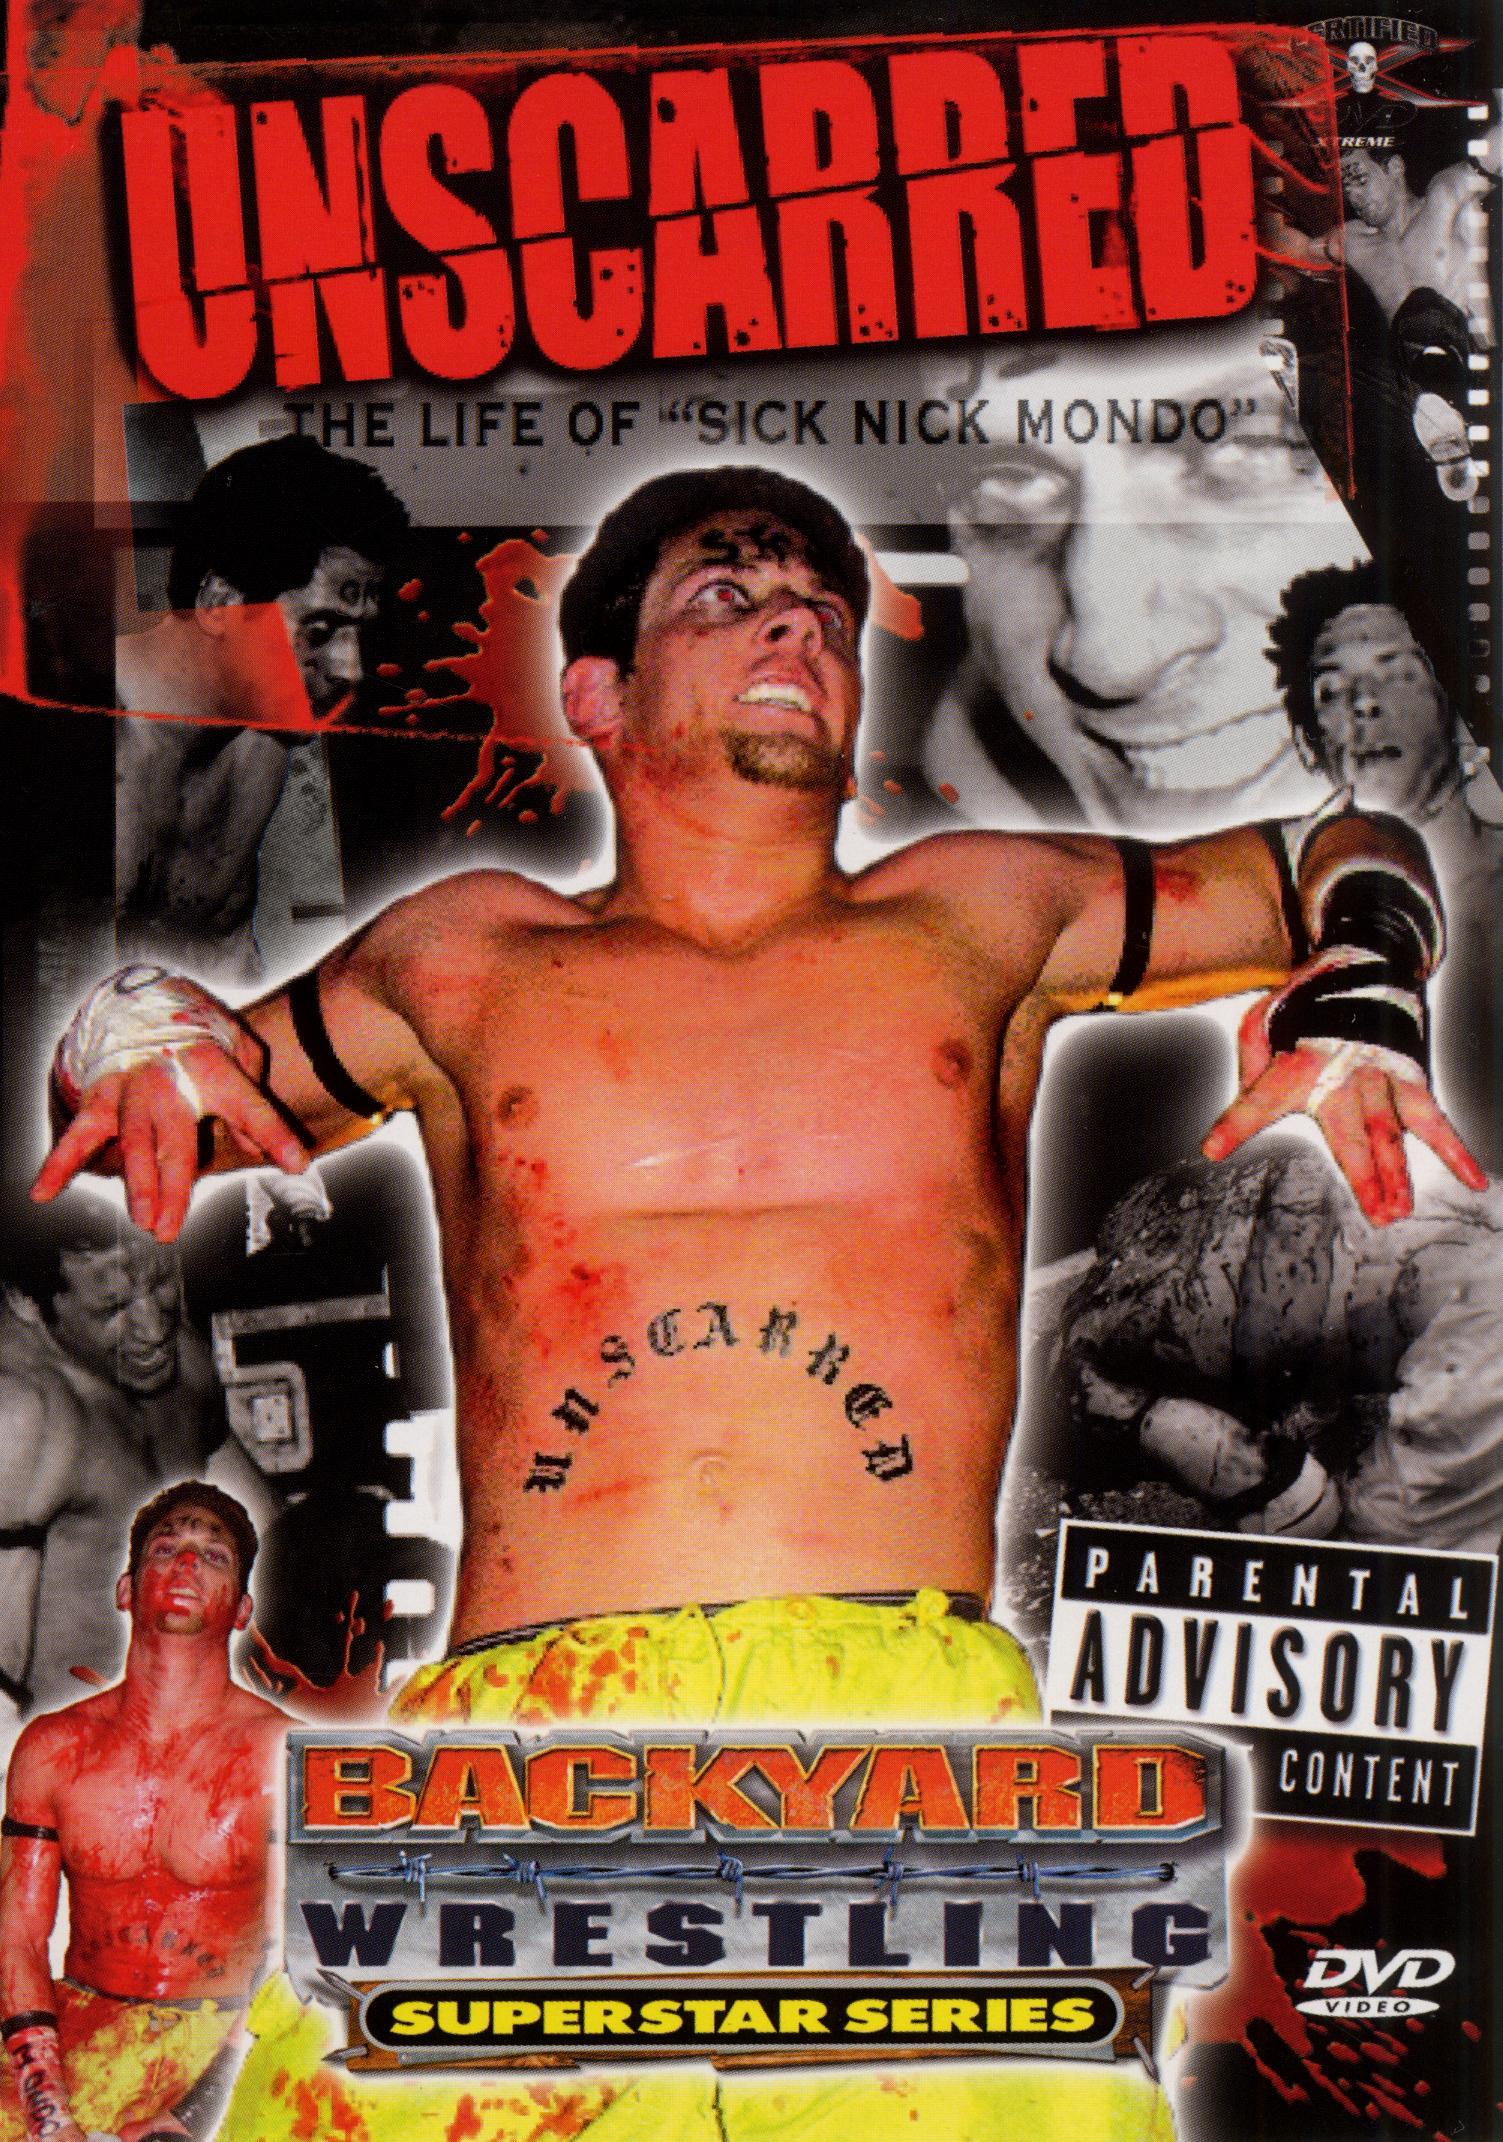 Backyard Wrestling Superstar Series: Unscarred - The Life of Nick Mondo